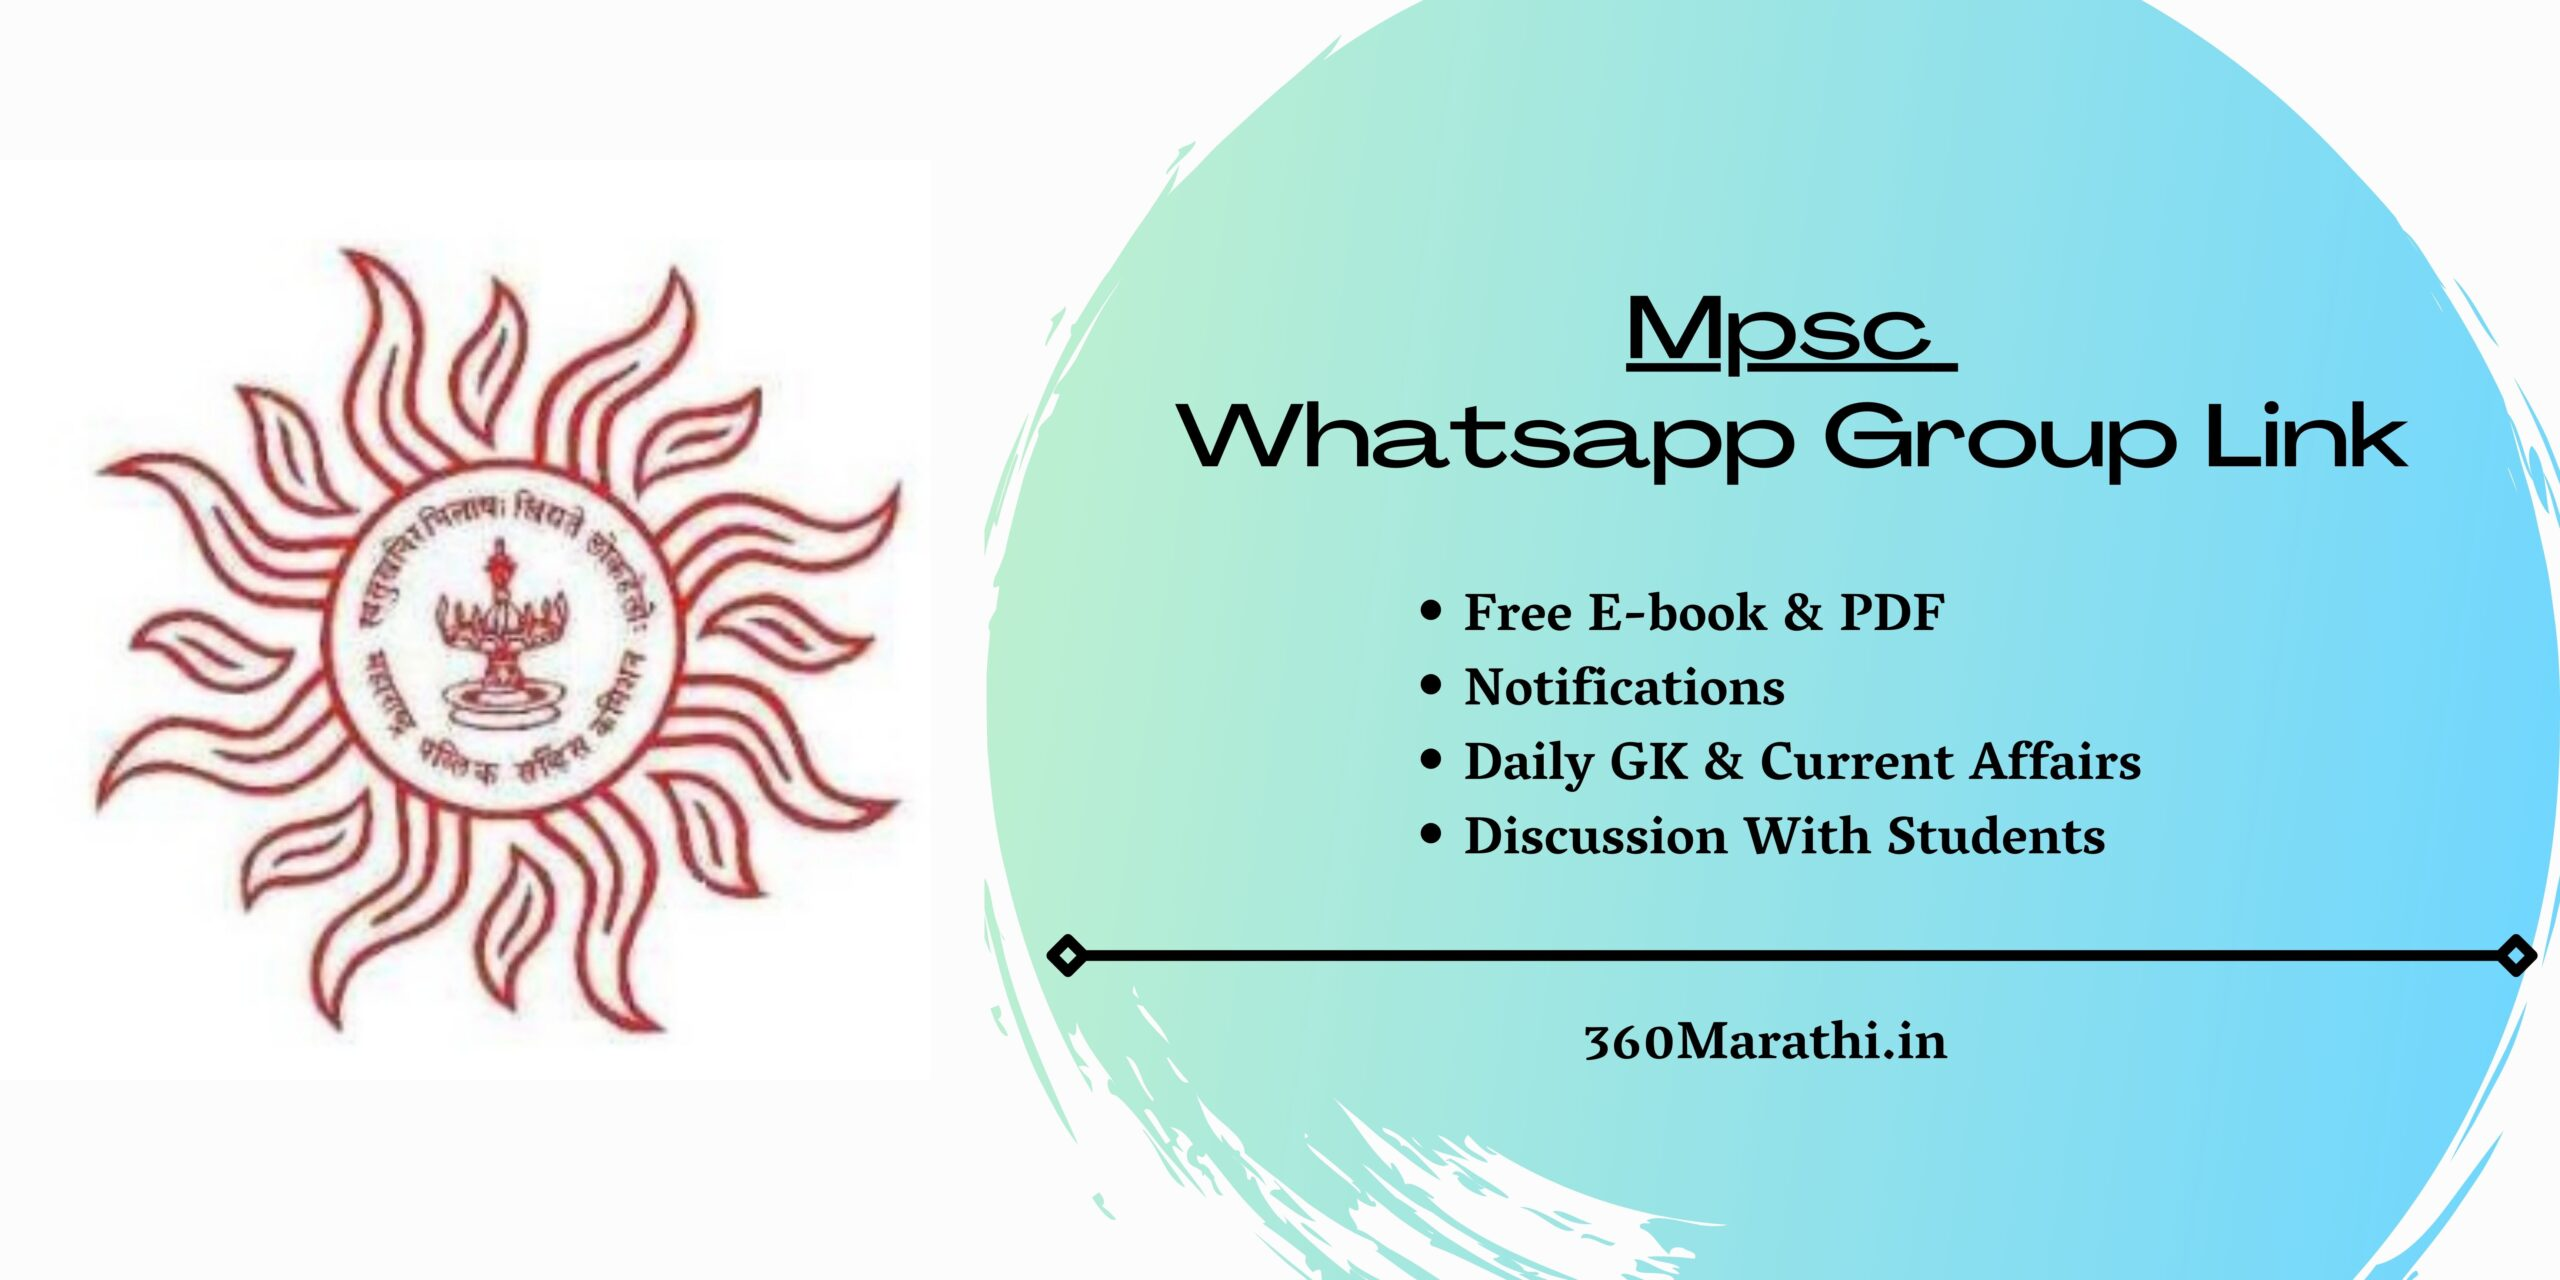 Mpsc Whatsapp Group Link